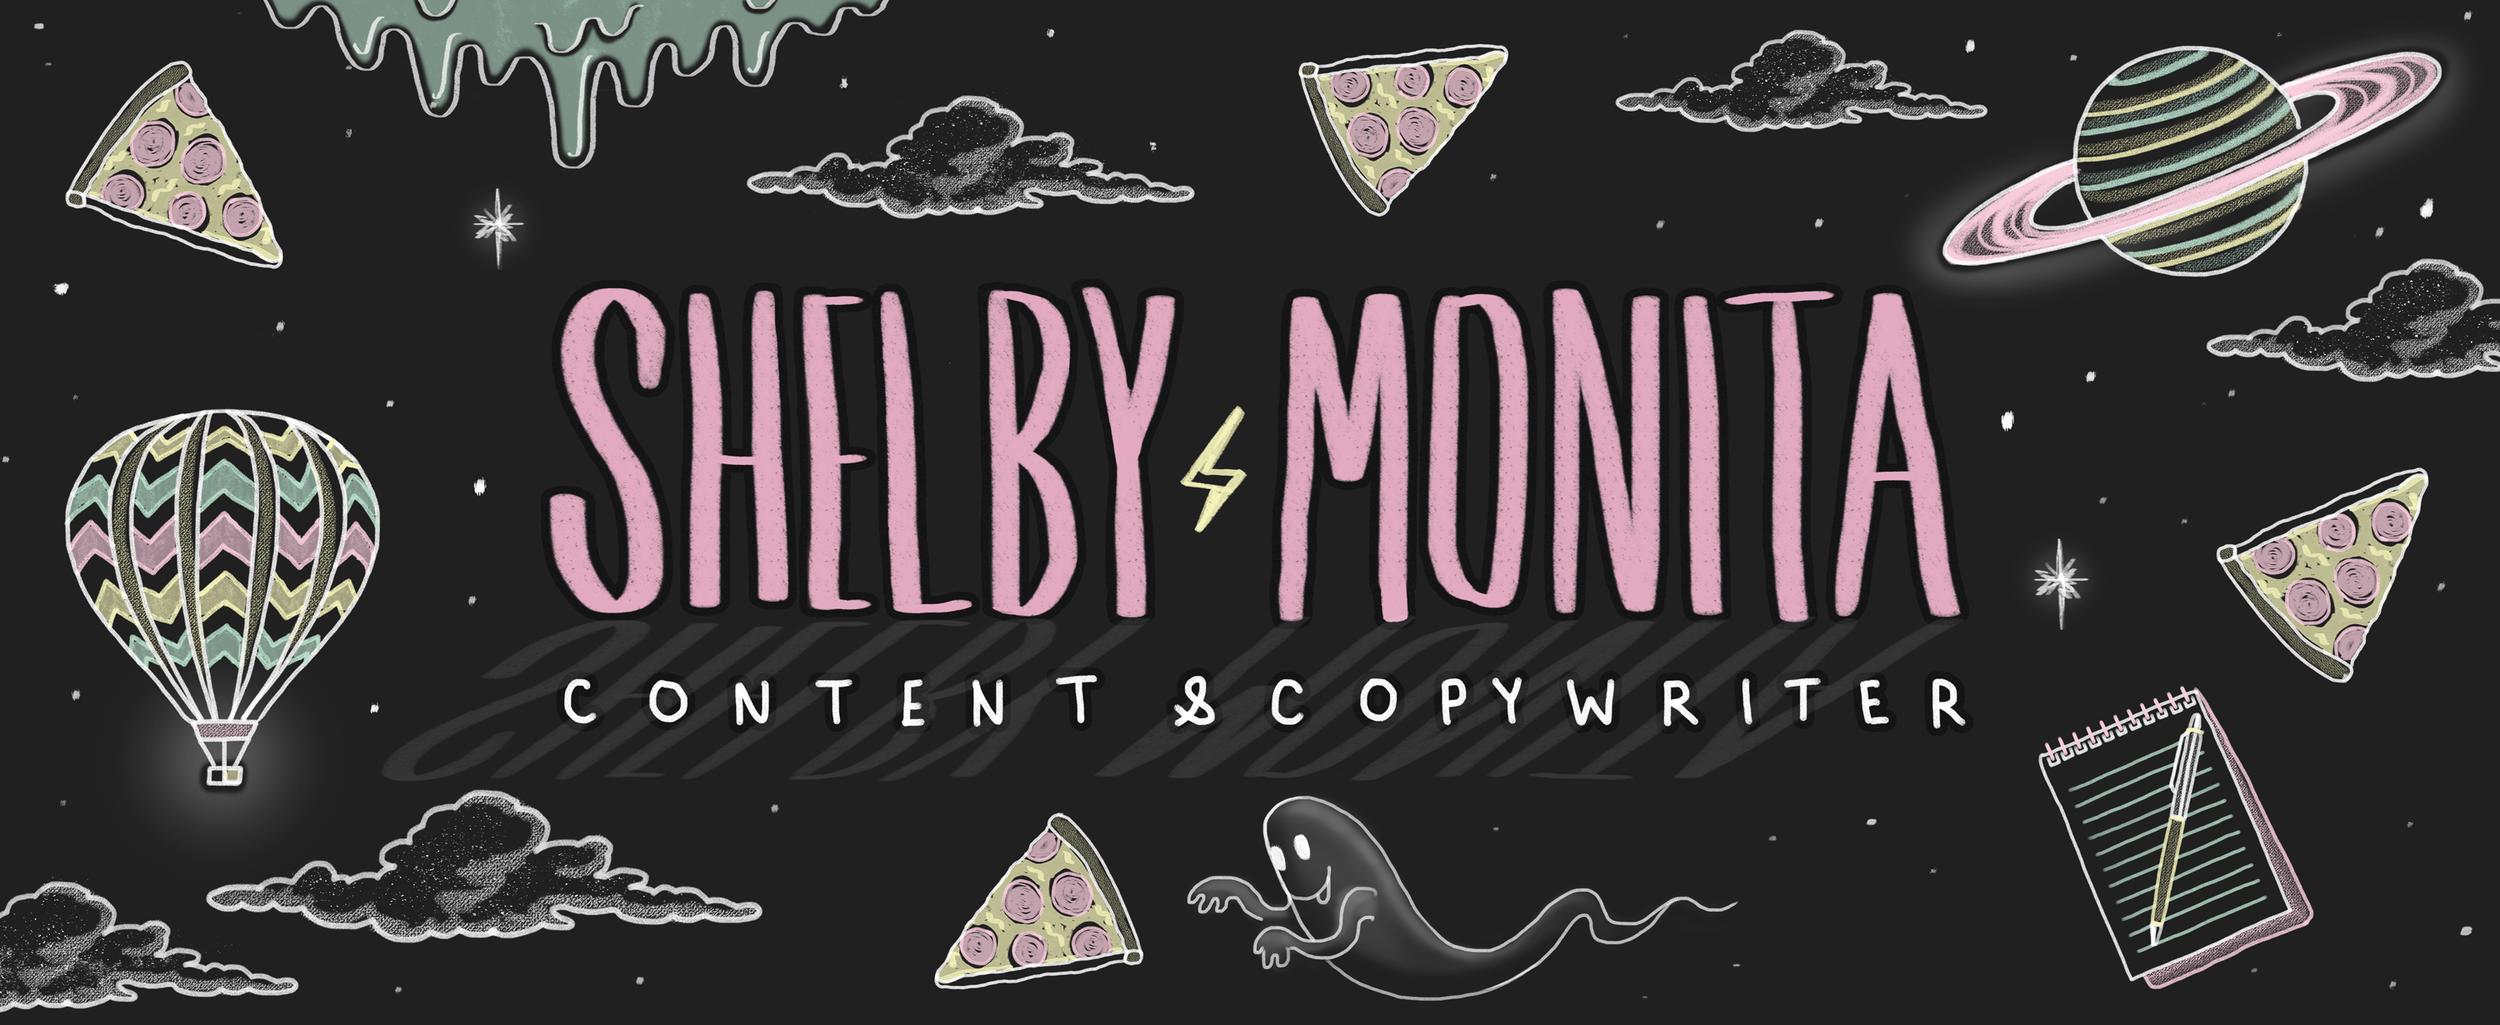 Shelby-Monita-Banner_V1-B-WEB.png